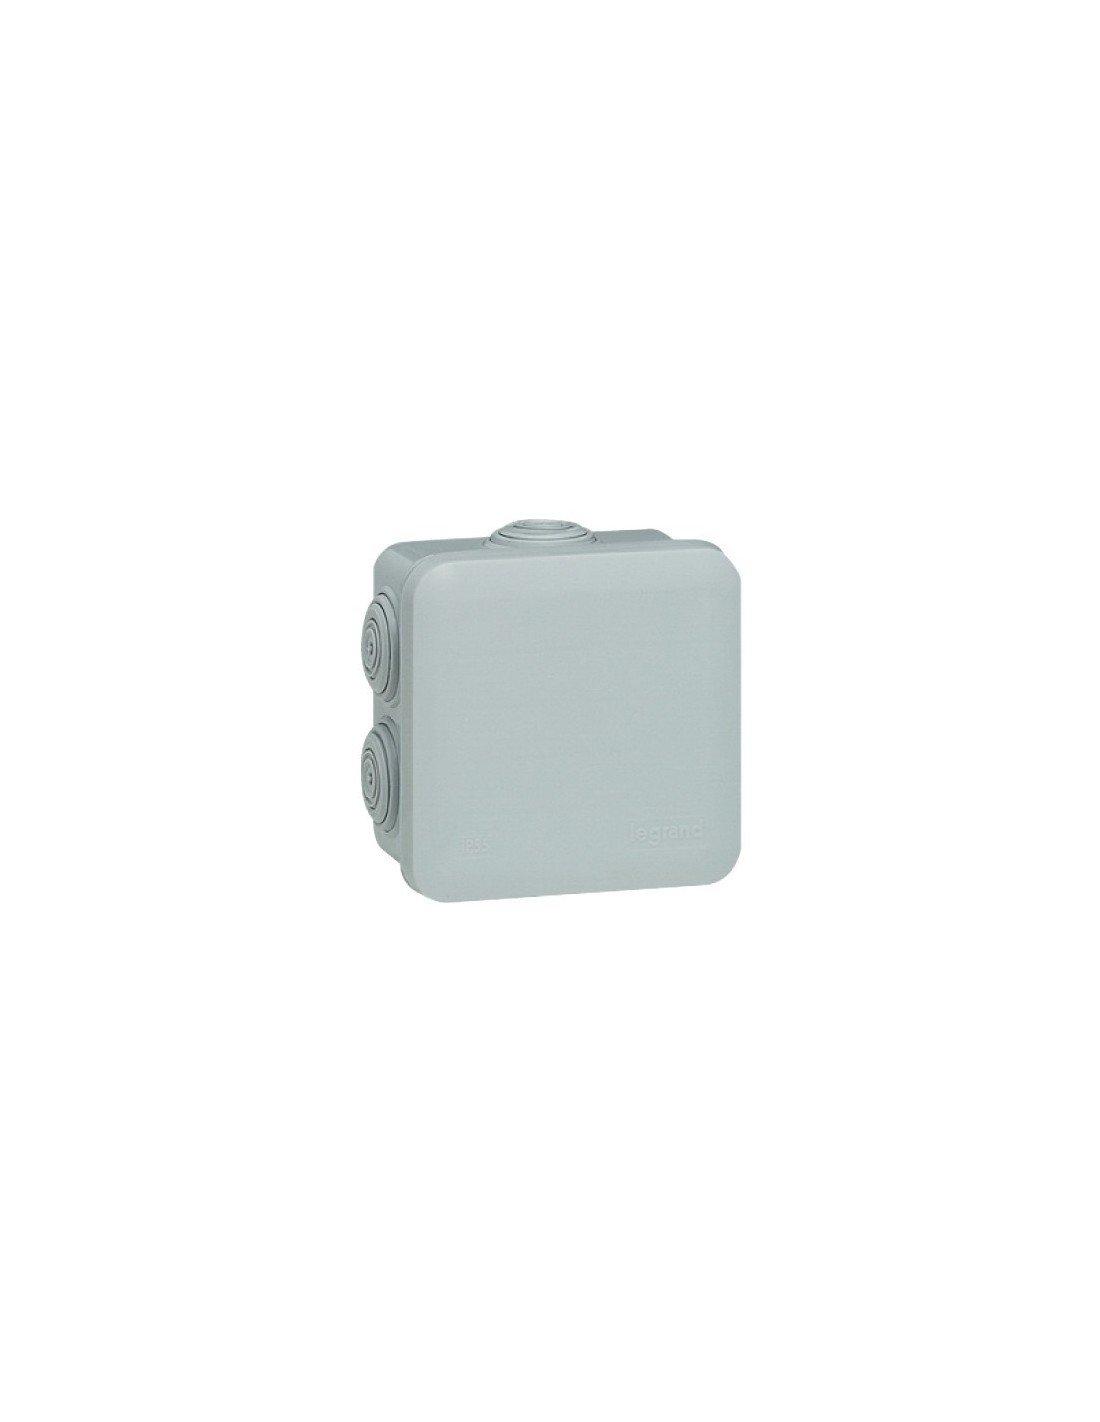 Legrand LEG94516 Square Junction Box Clip-On Fastening Grey 65 x 65 x 40 mm